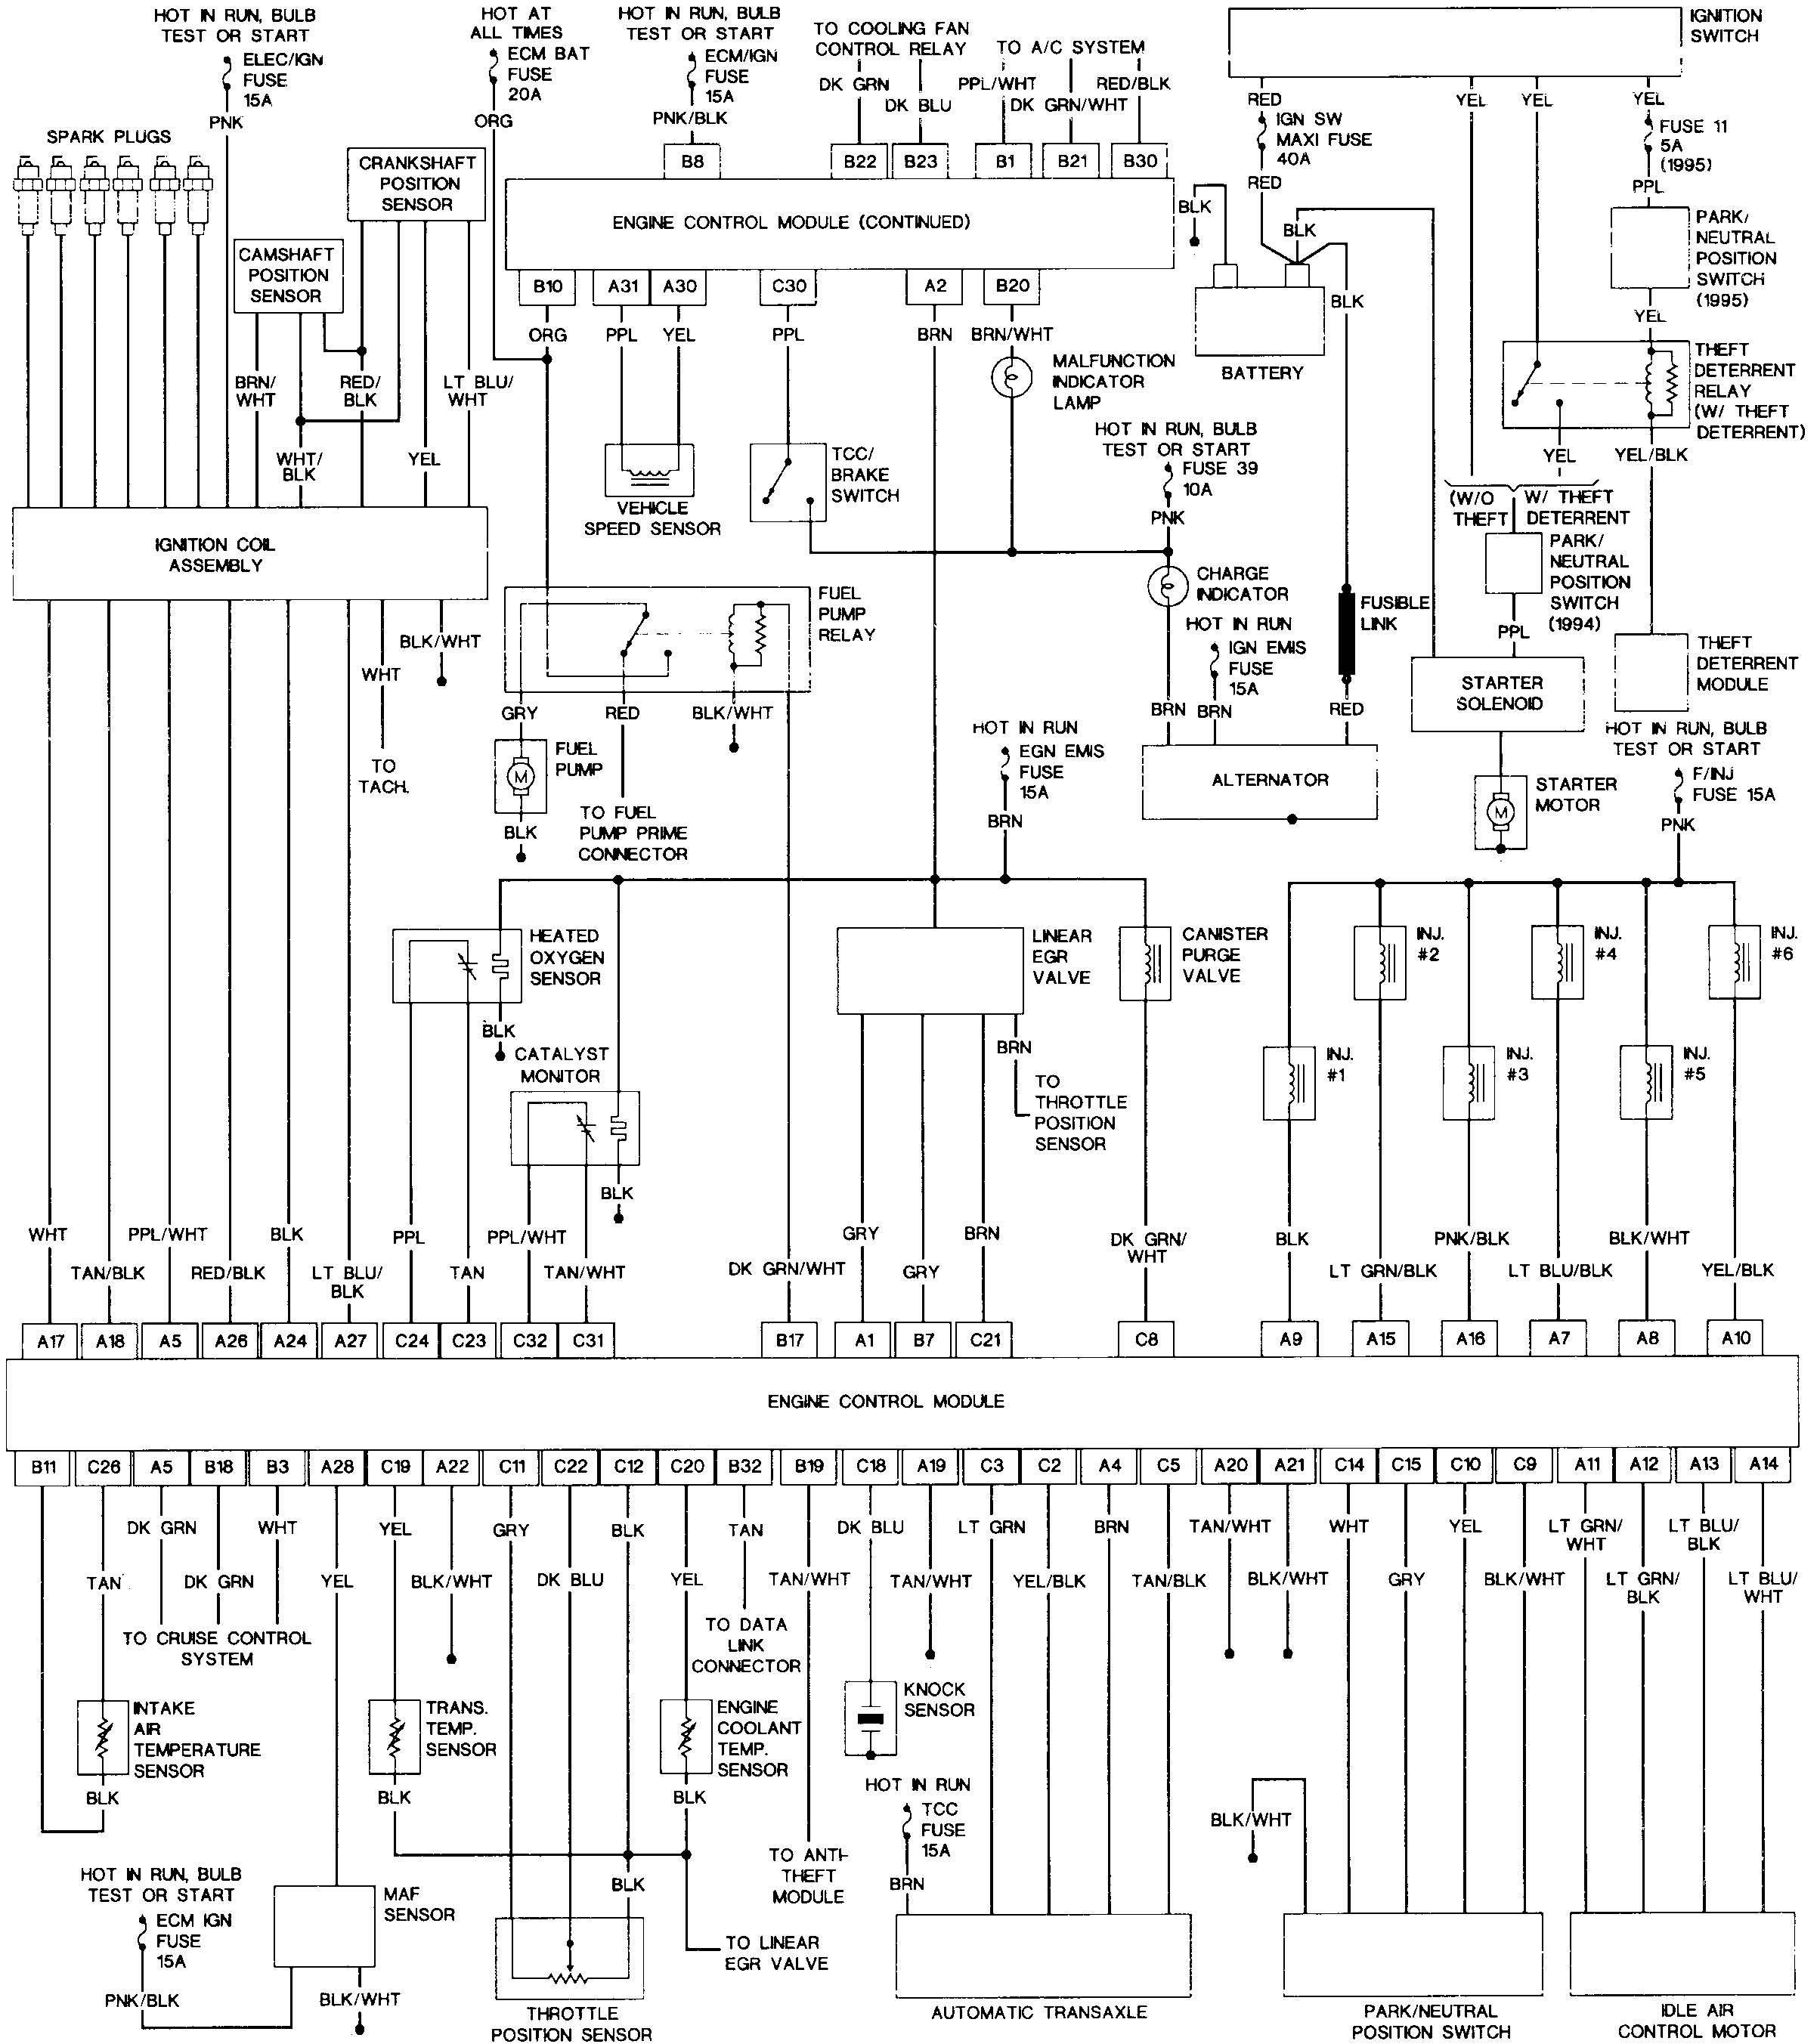 1998 Buick Century Engine Diagram 95 Buick Park Avenue Fuse Diagram Of 1998 Buick Century Engine Diagram